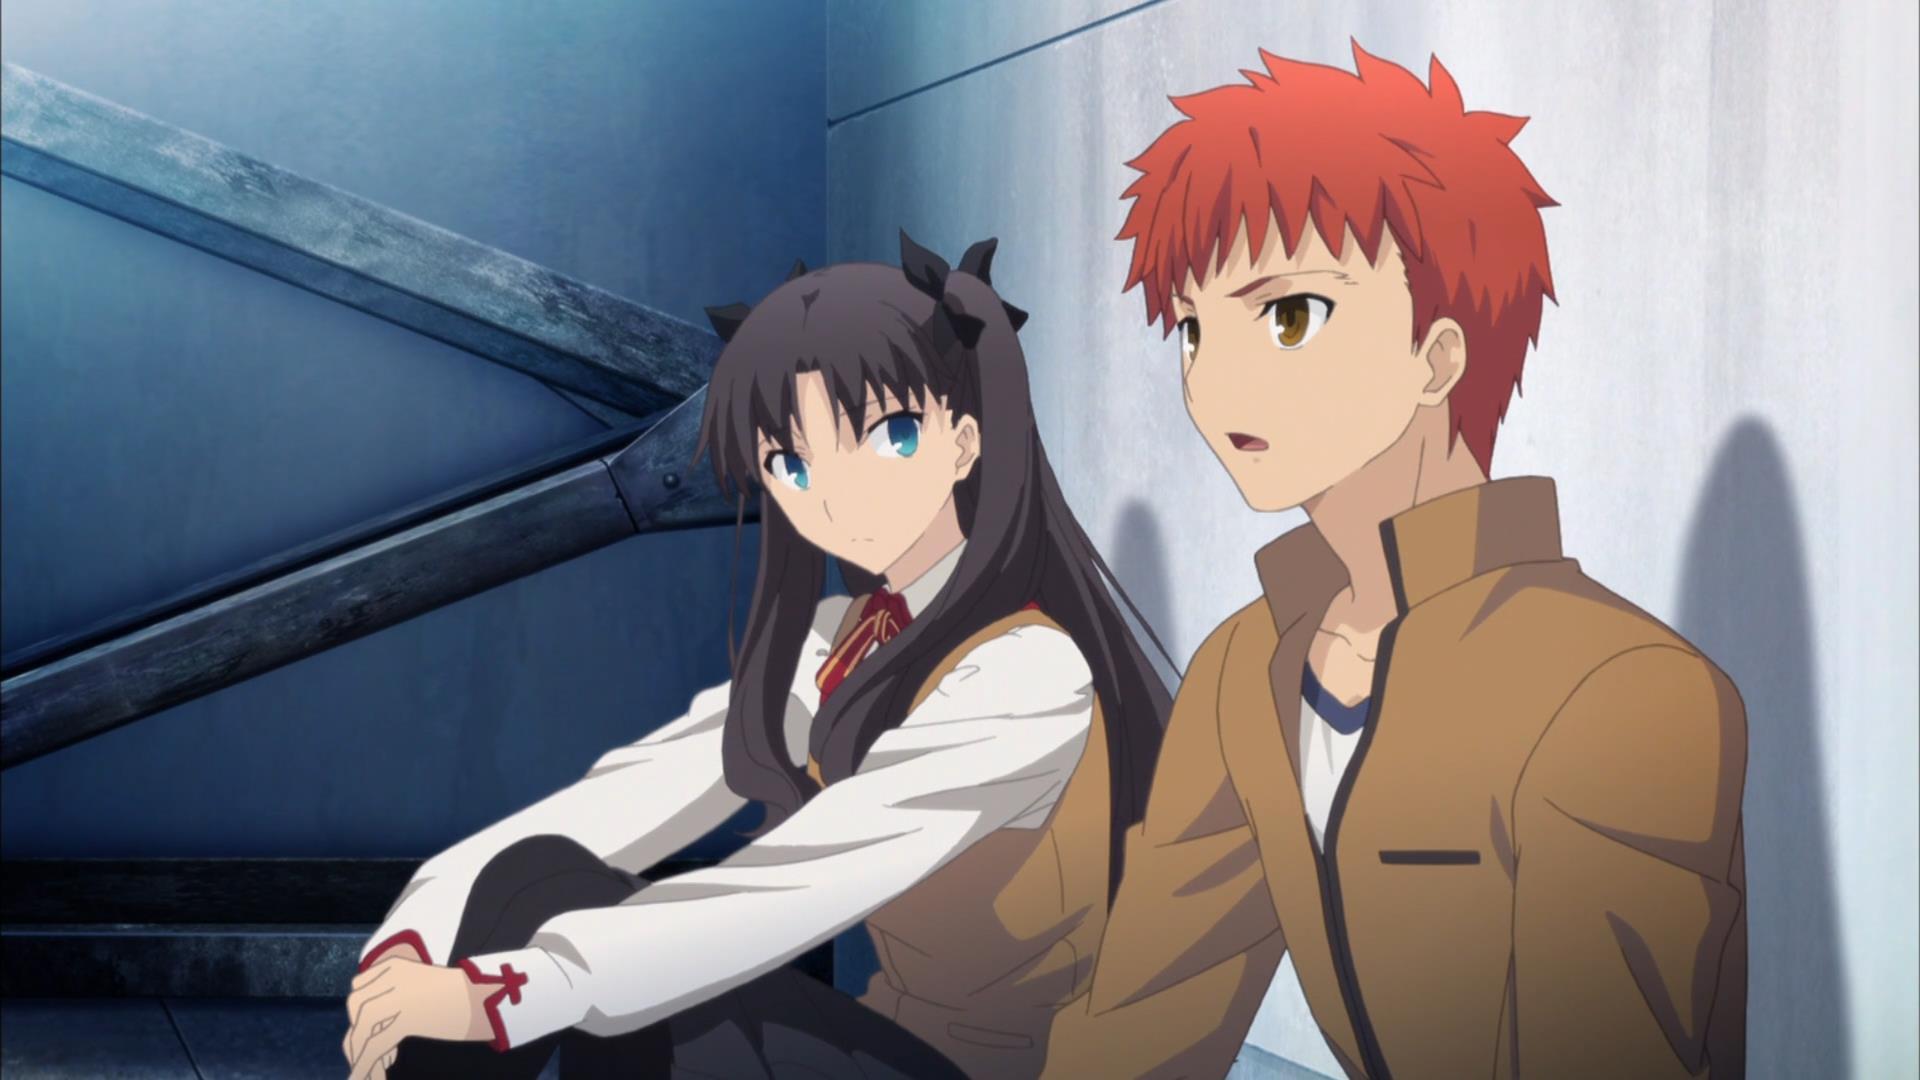 http://anime.astronerdboy.com/wp-content/uploads/2014/11/x04-Rin-and-Shirou.jpg